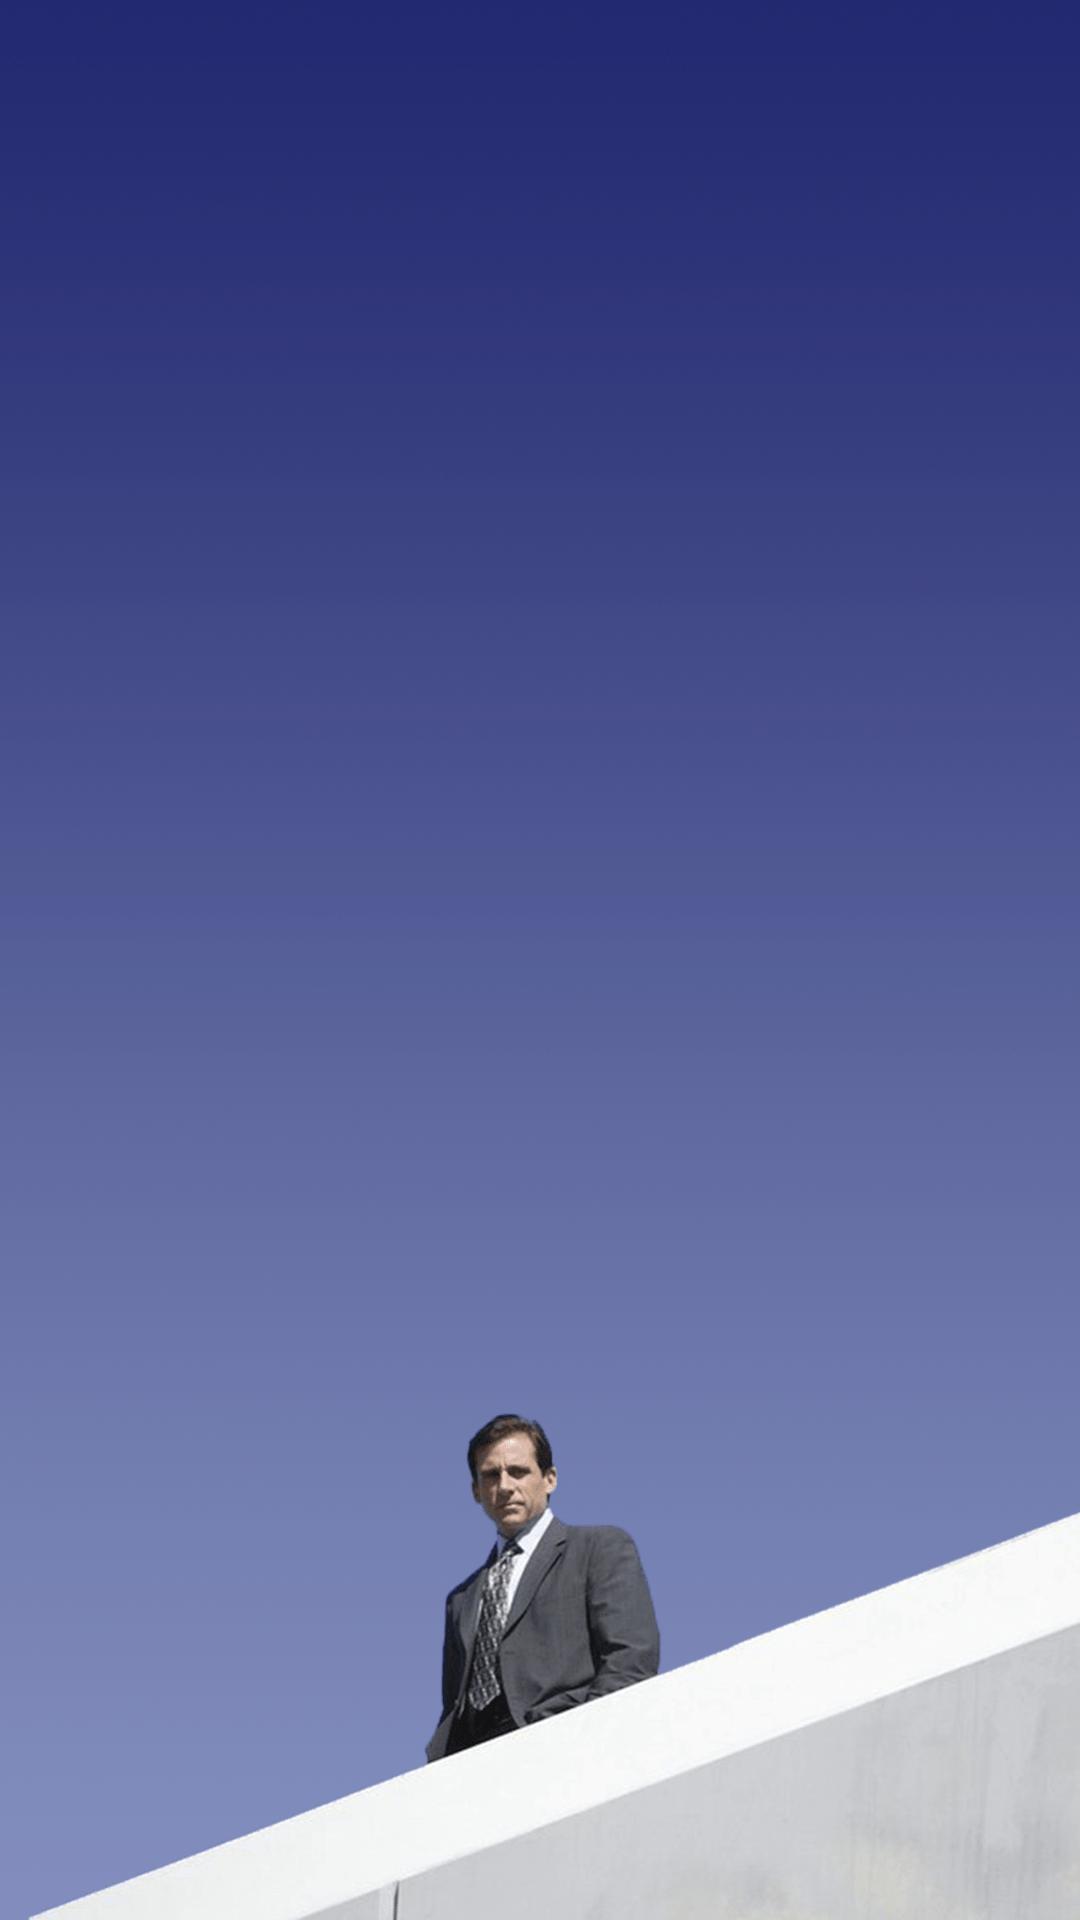 Dunder Mifflin Iphone Wallpapers Top Free Dunder Mifflin Iphone